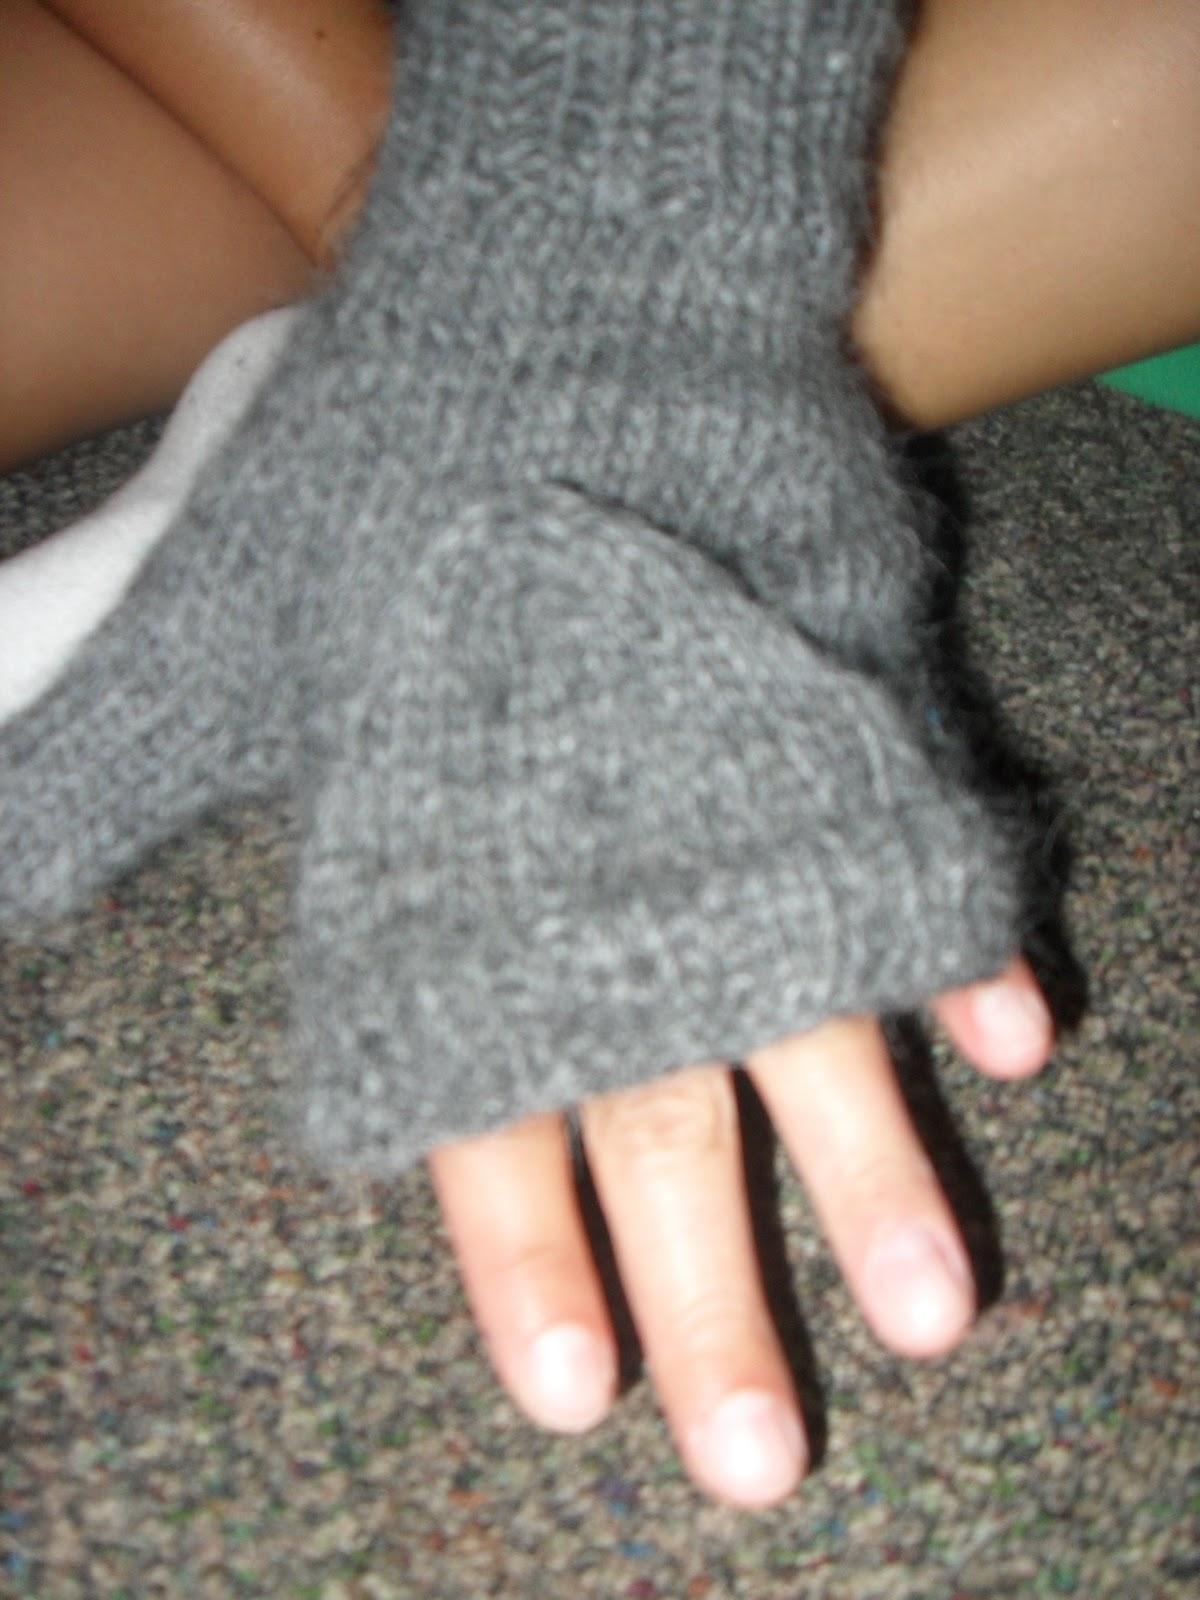 Knitting Pattern For Flip Top Mittens : Knitting 60 Projects From 60 Quick Knits: Pattern #56 Flip Top Mittens